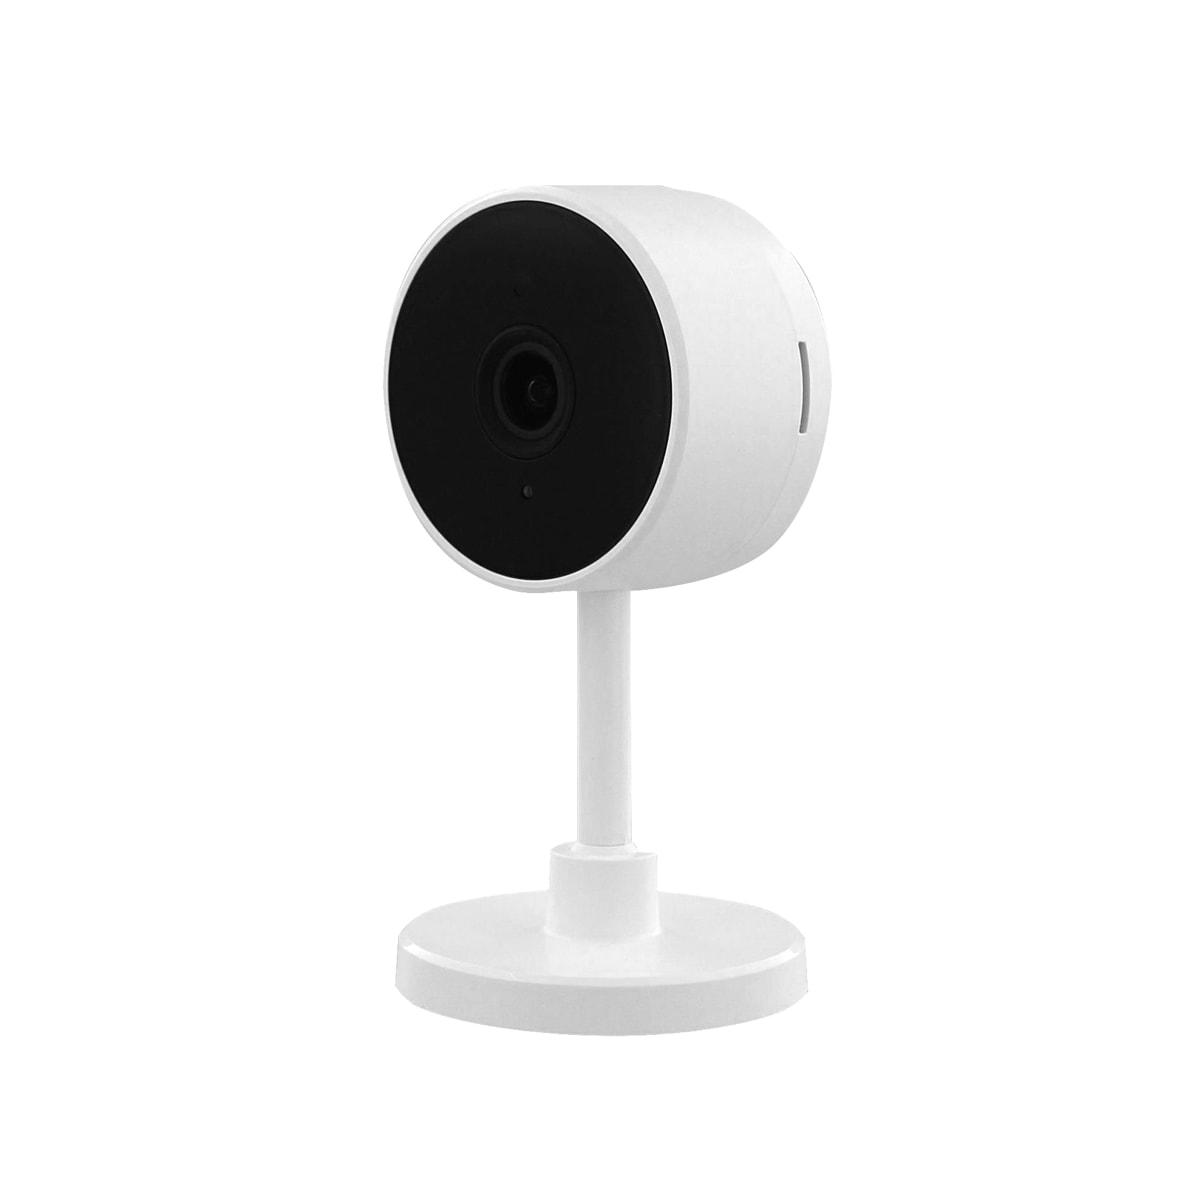 Connected surveillance camera